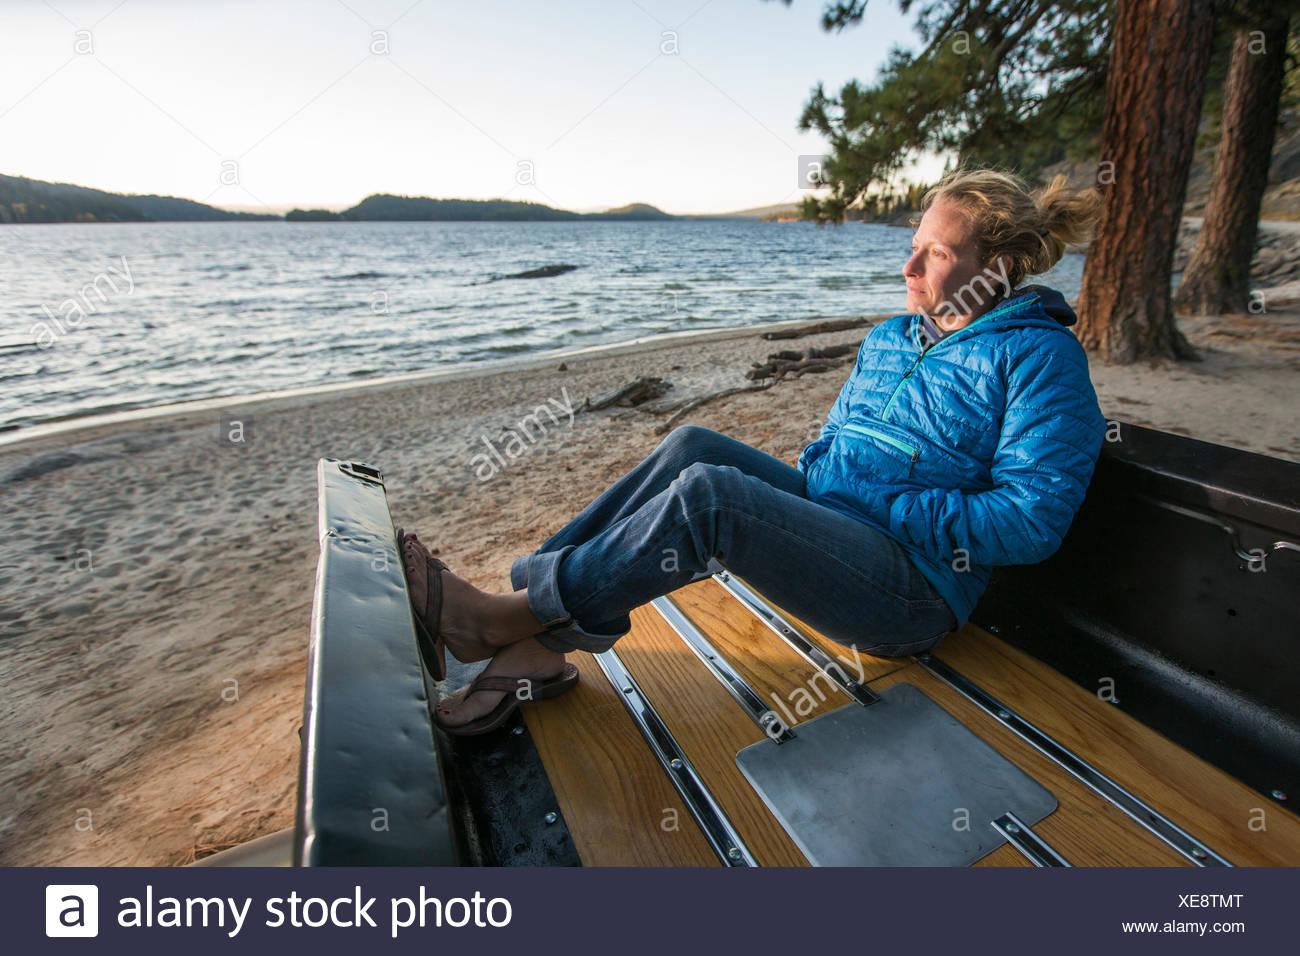 Frau in renovierten Lkw beobachten Sonnenuntergang sitzen, Payette Lake, McCall, Idaho, USA Stockbild